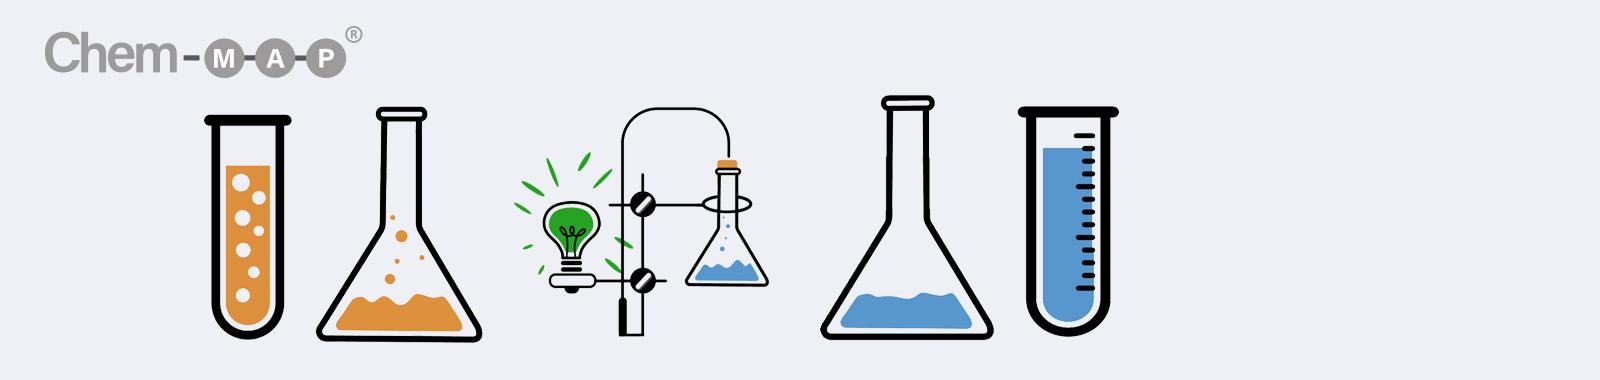 Chem-MAP